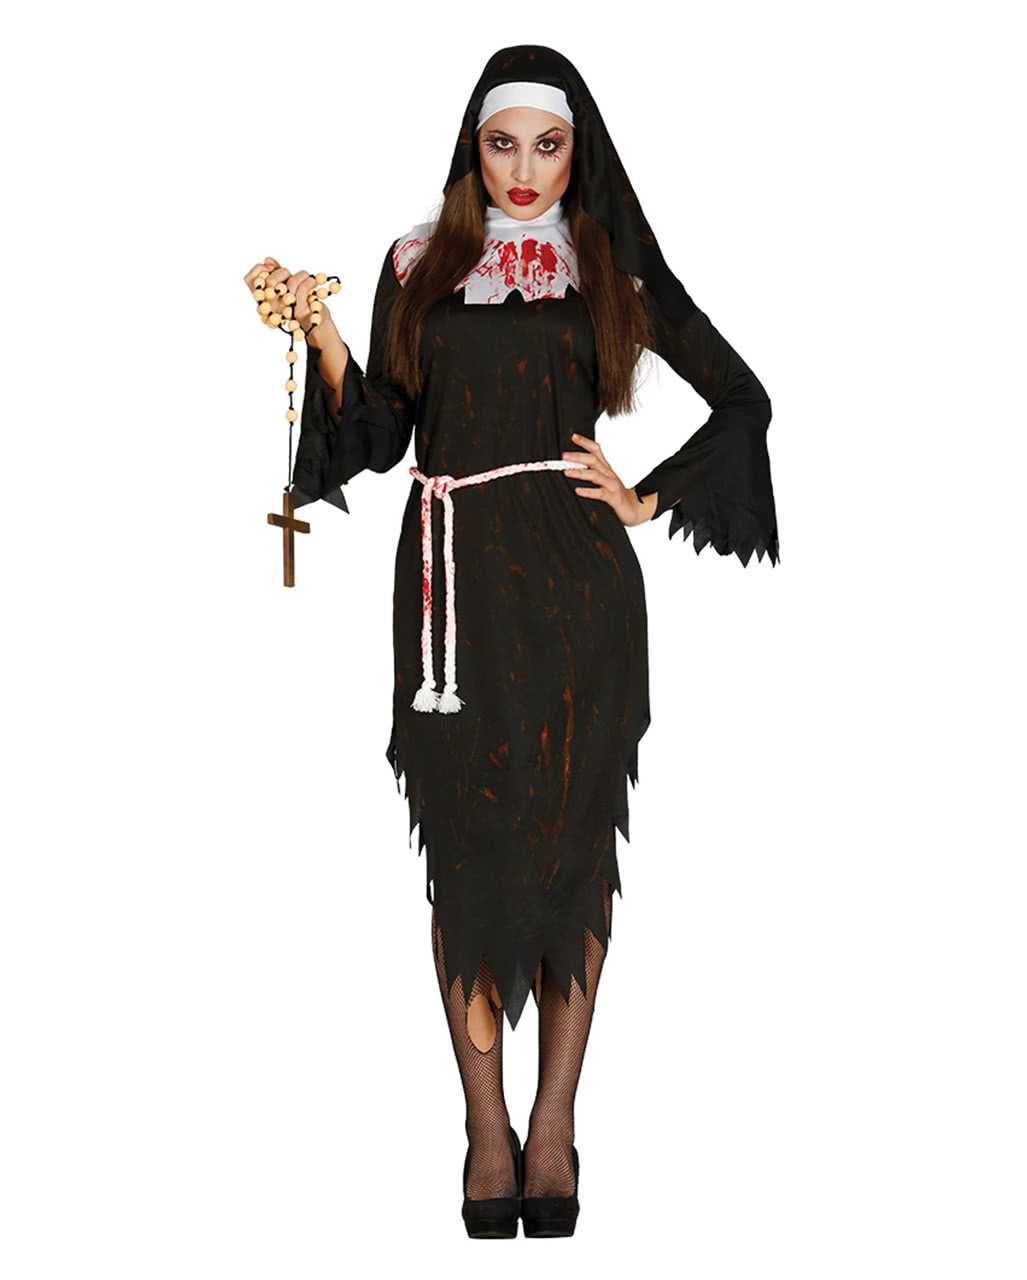 zombie klosterschwester kost m als verkleidung f r halloween partys karneval universe. Black Bedroom Furniture Sets. Home Design Ideas